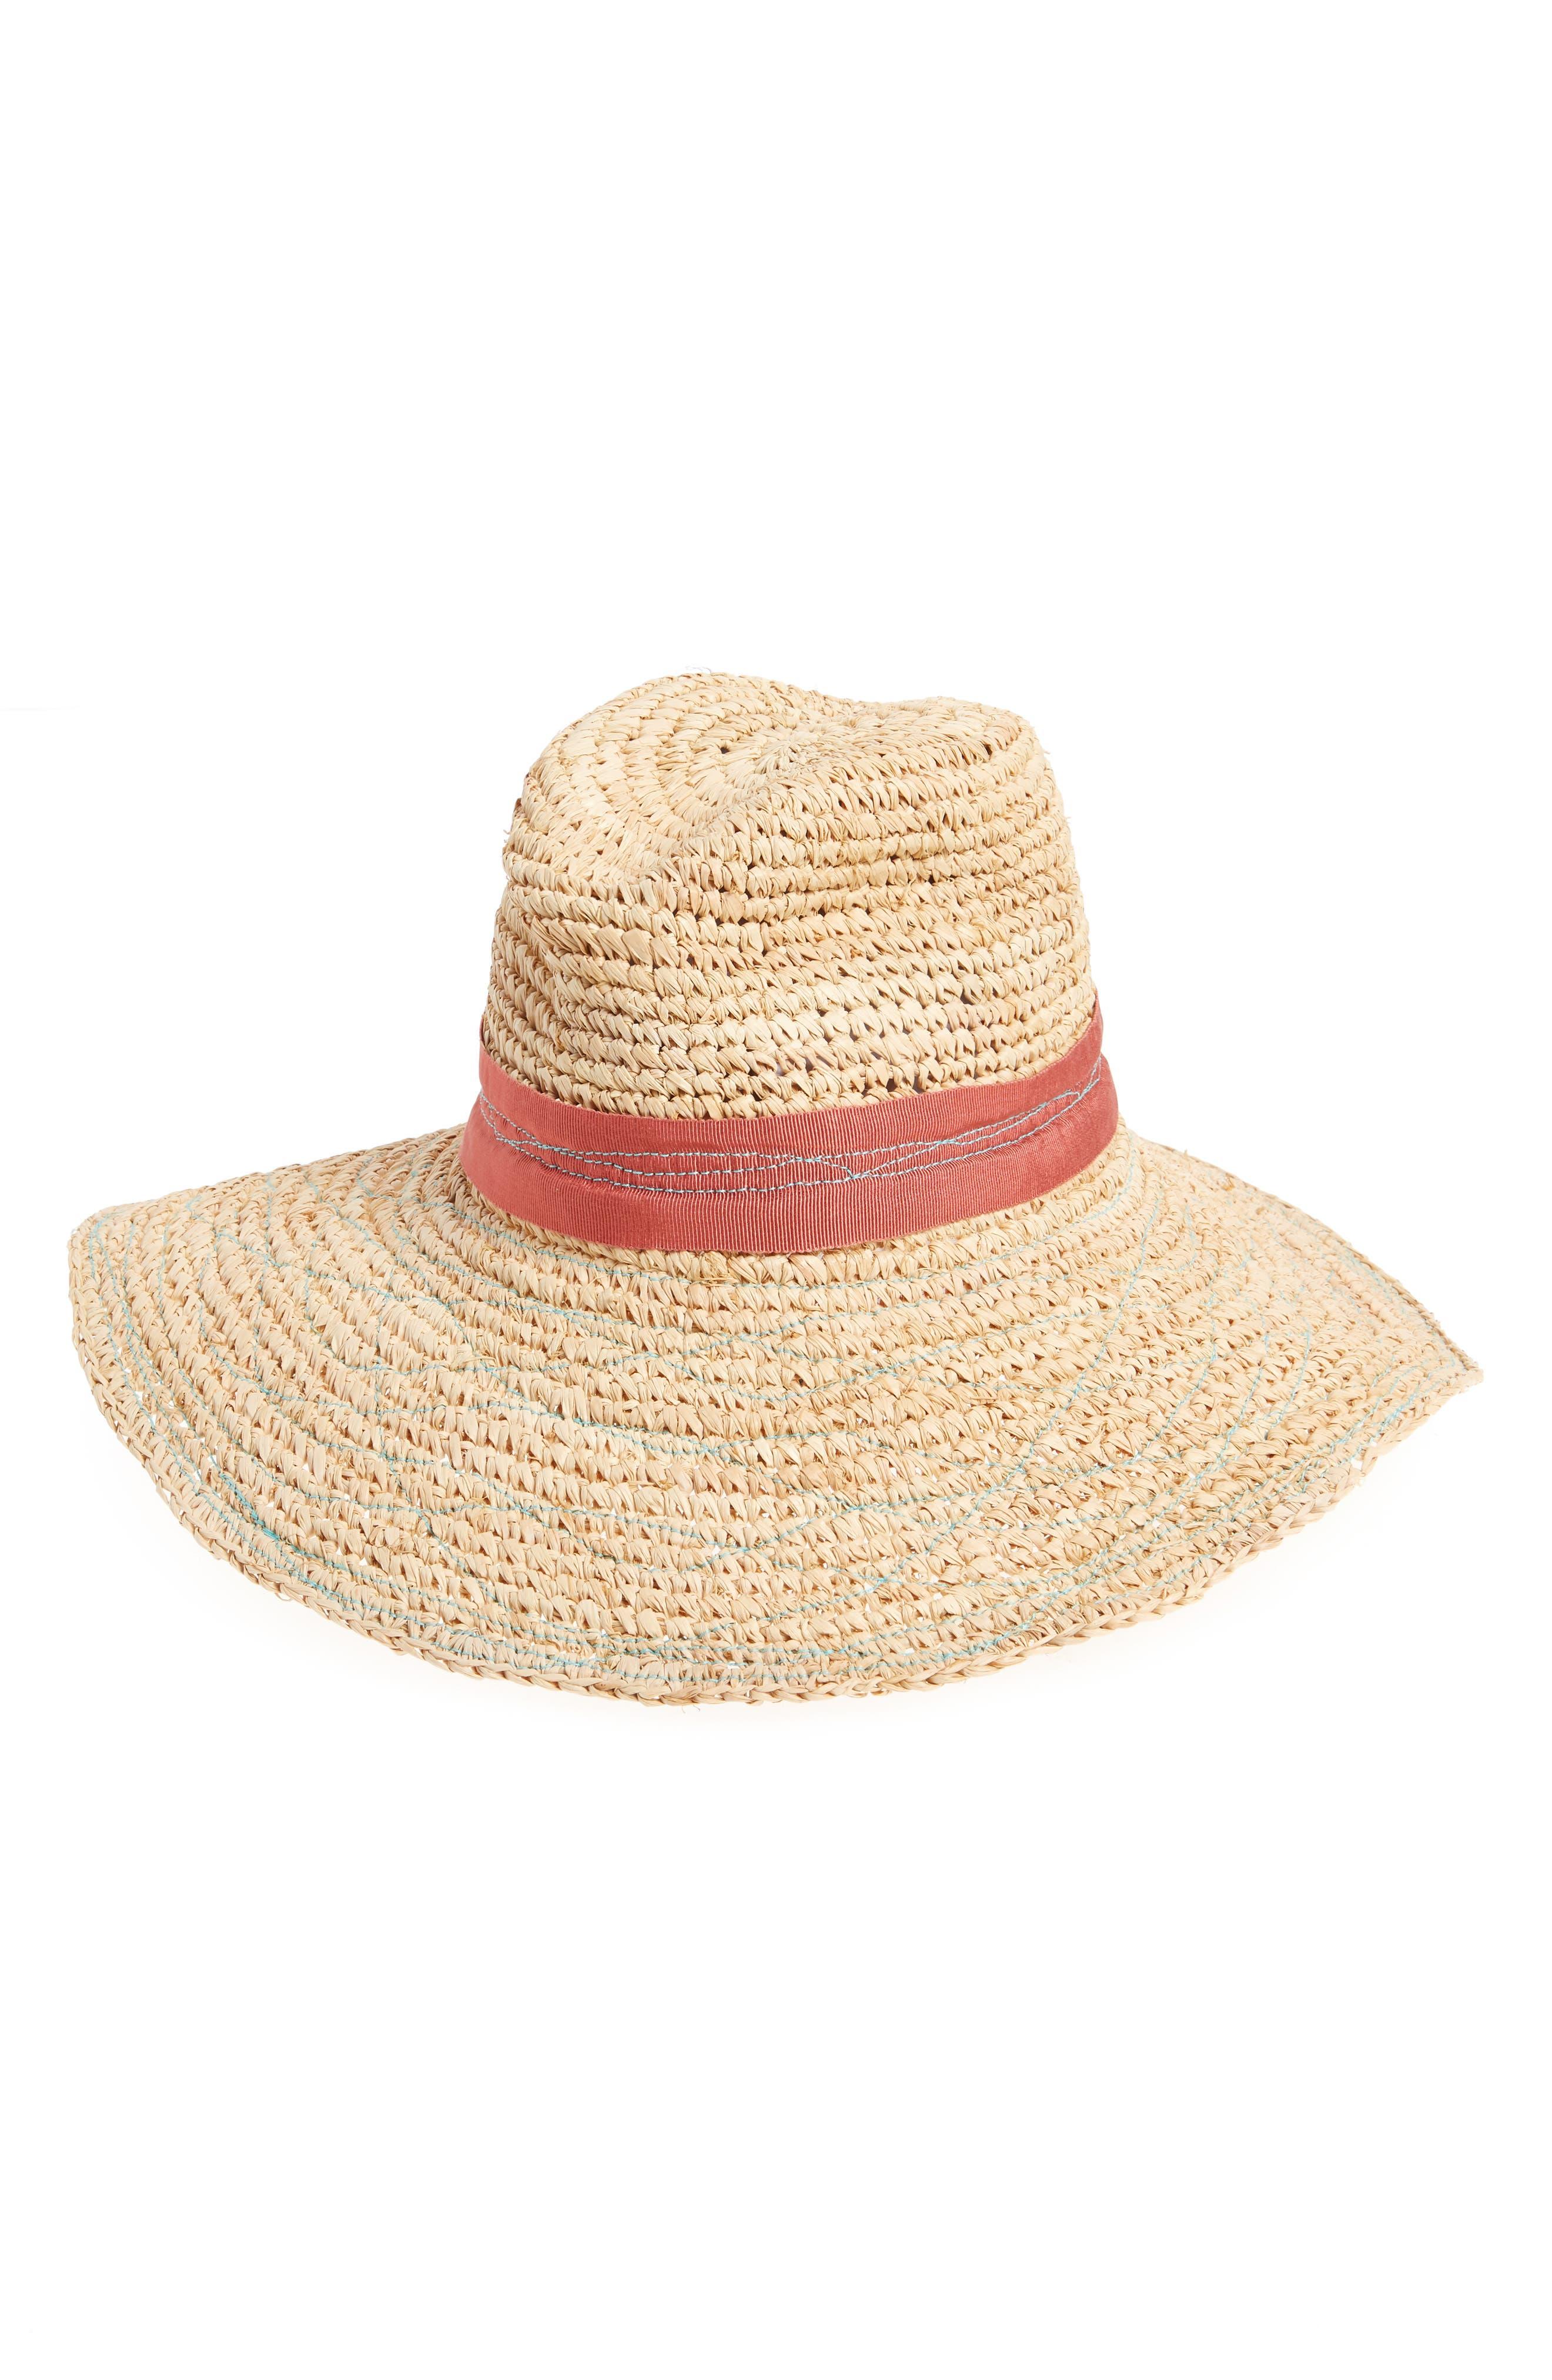 LOLA HATS RE-MAMA TARBOUSH RAFFIA HAT - RED